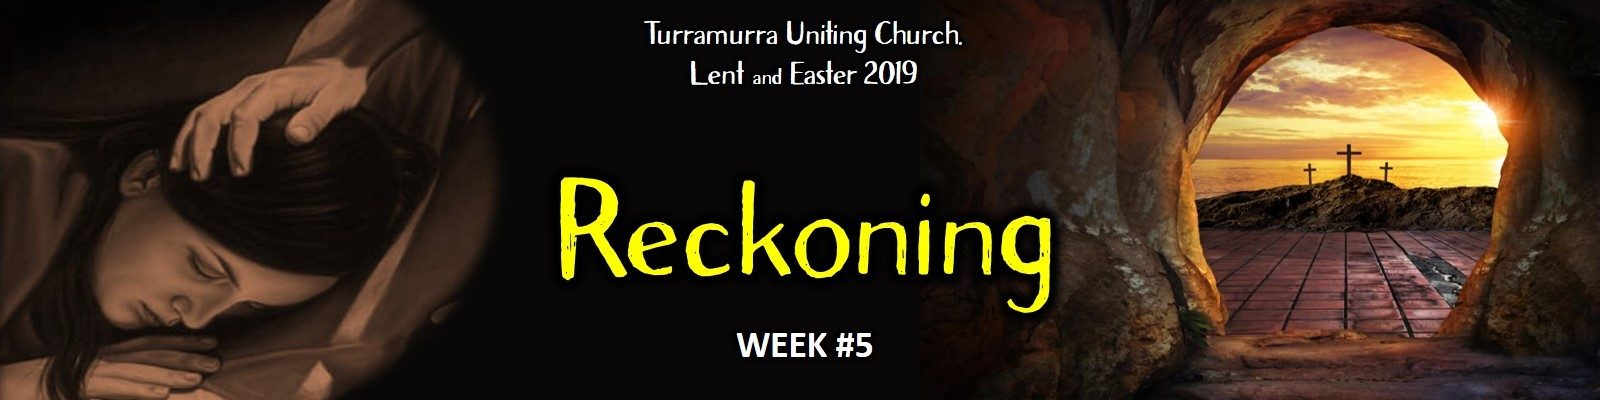 Lent Bible Study #5 - Reckoning